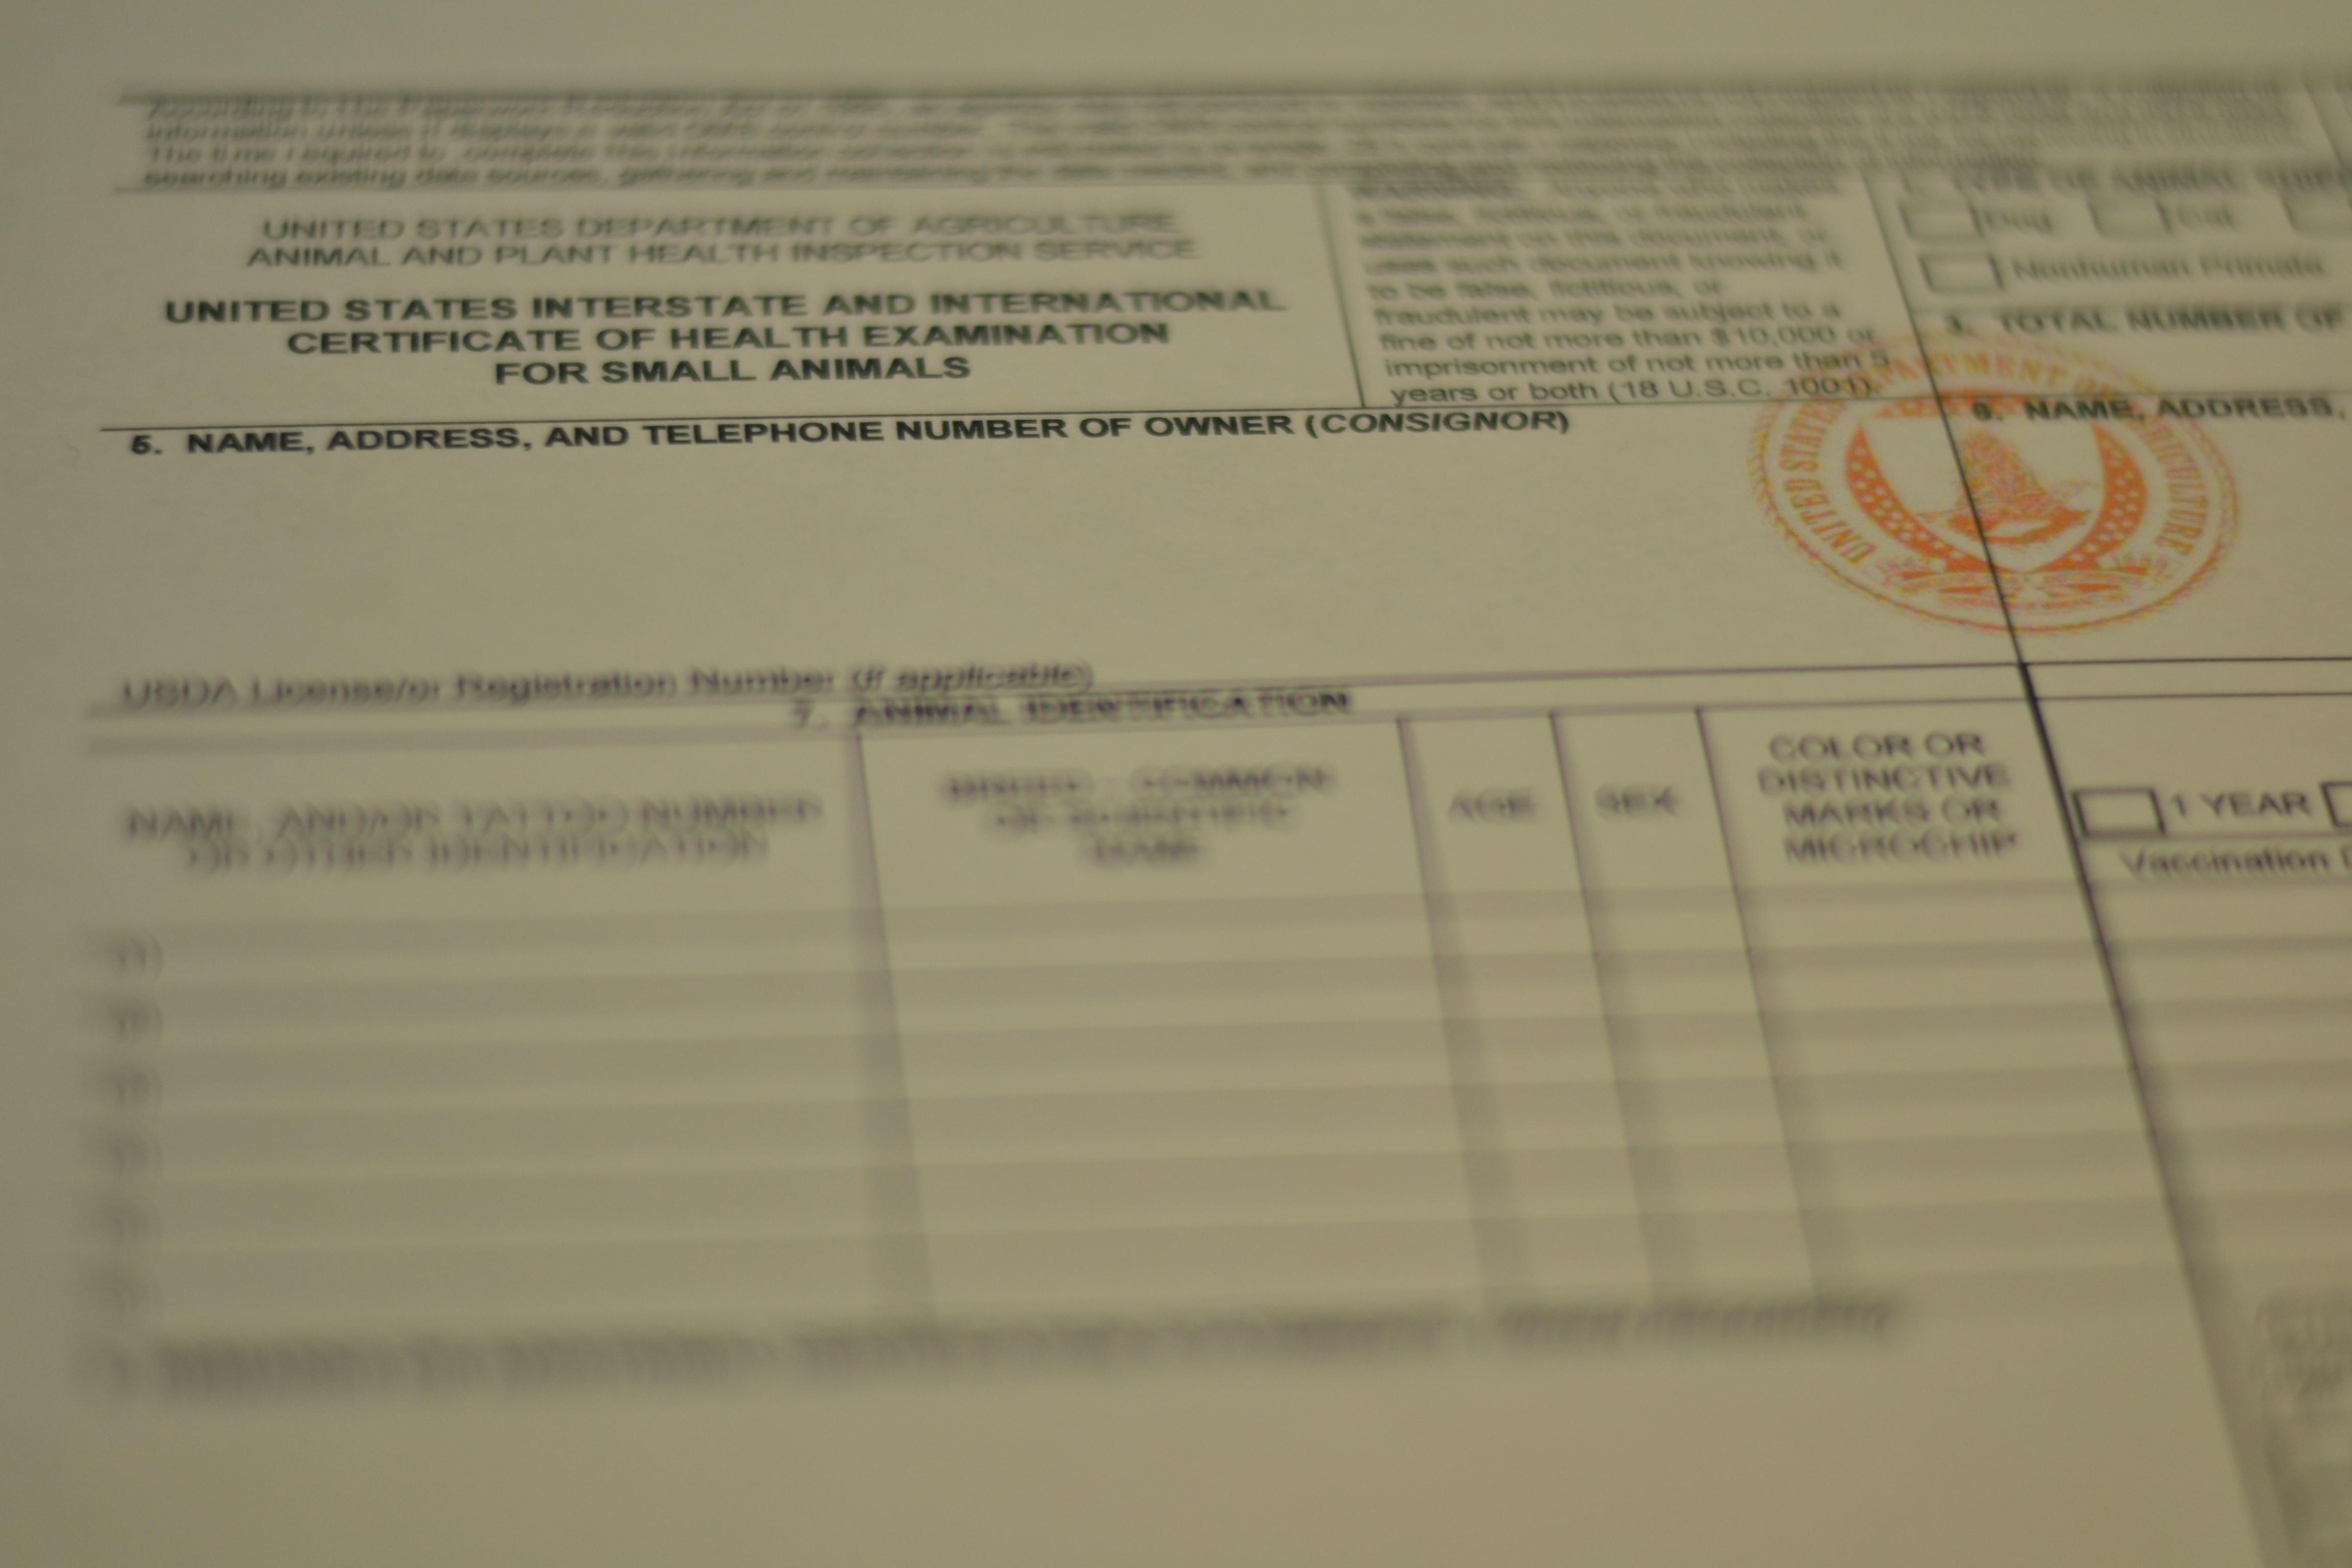 form veterinary usda 7001 international certificate health travel pet aphis evesham nj clinic archives vet cat passport pdf marlton certificates